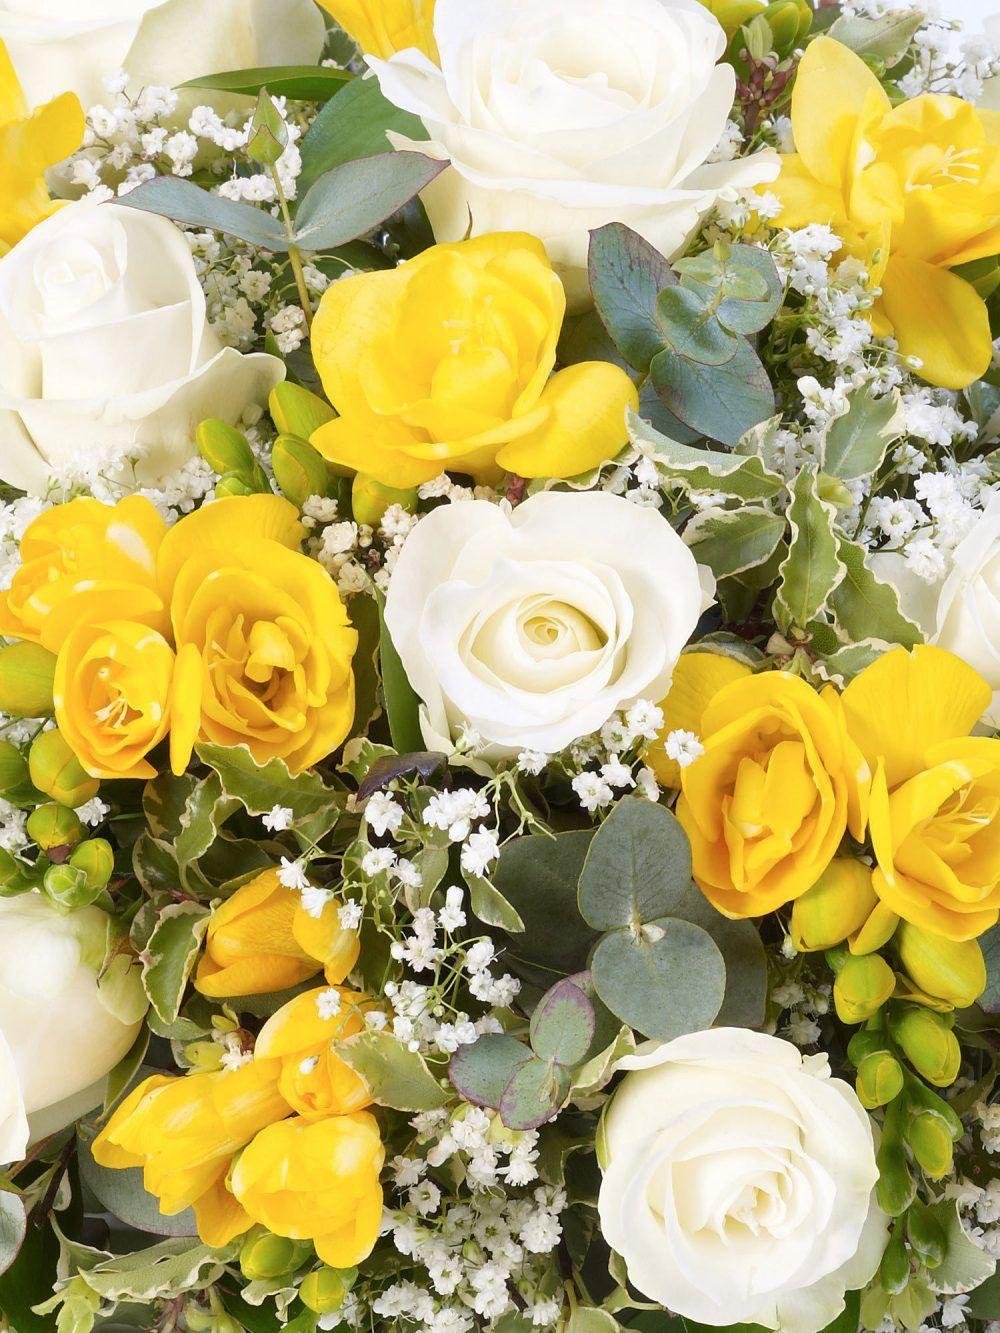 Rose And Freesia Posy Yellow And White 1